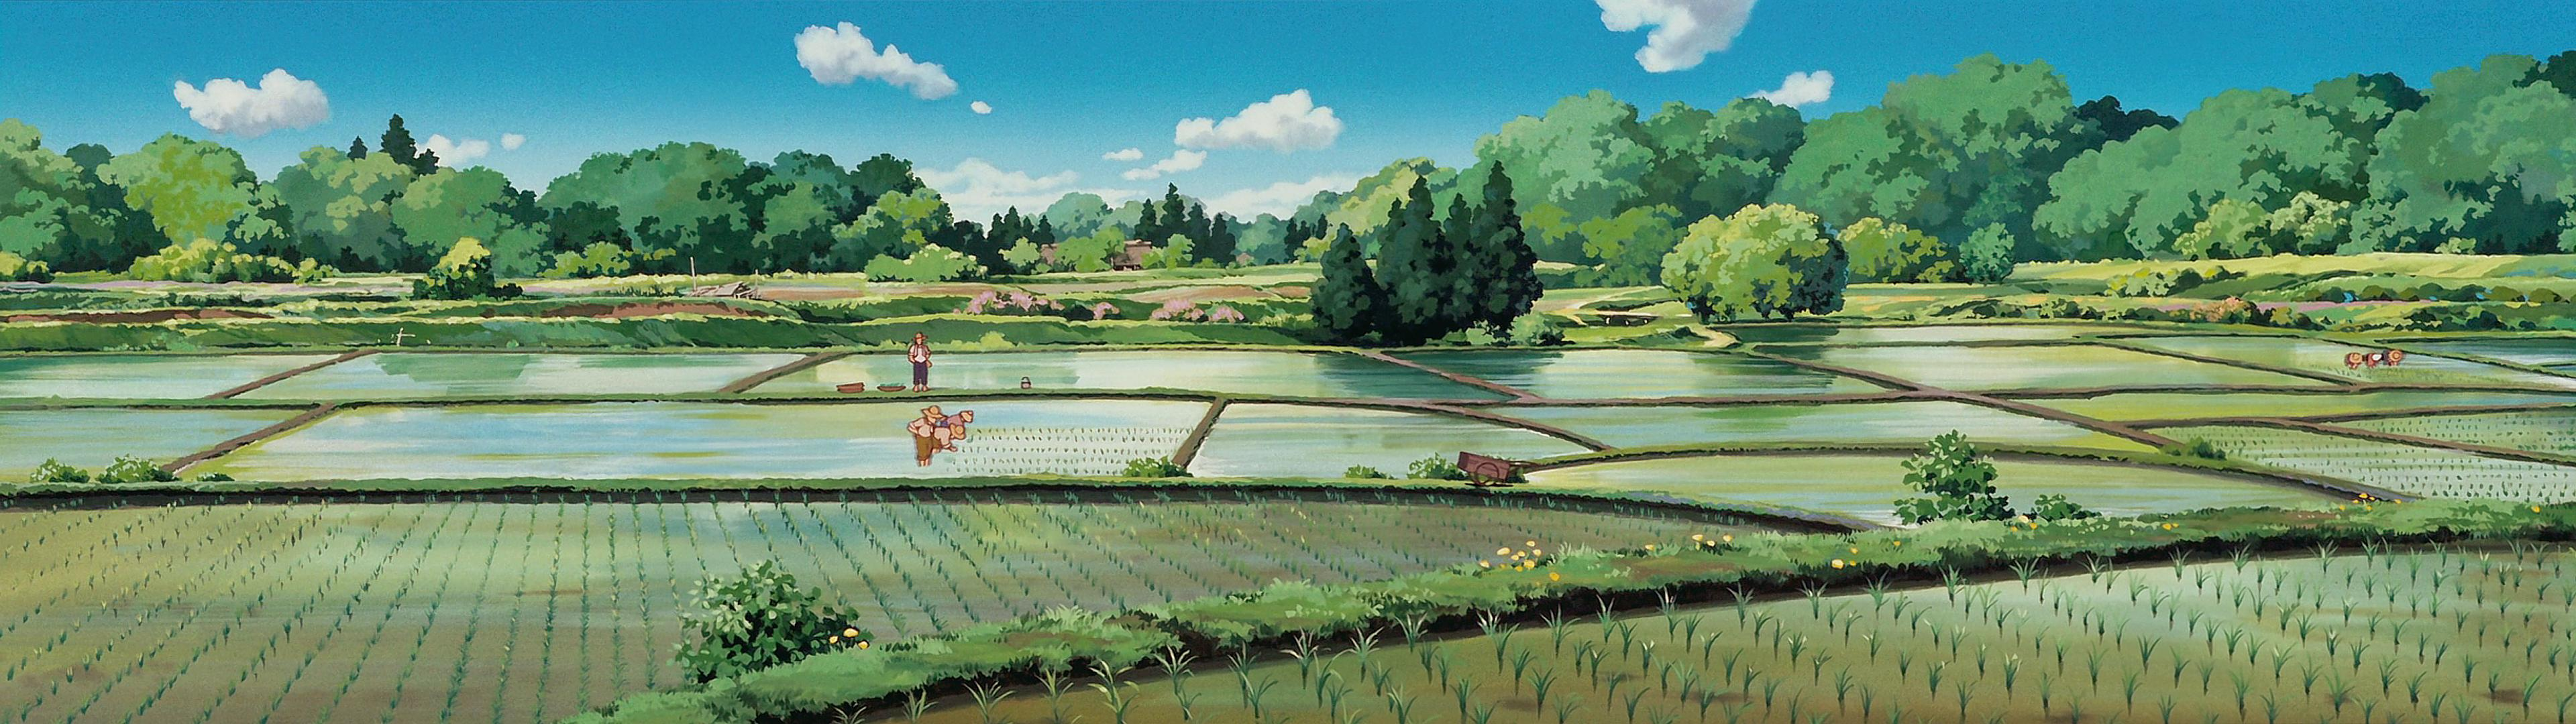 Studio Ghibli Dual Monitor Wallpaper Dump   Album on Imgur 3840x1080